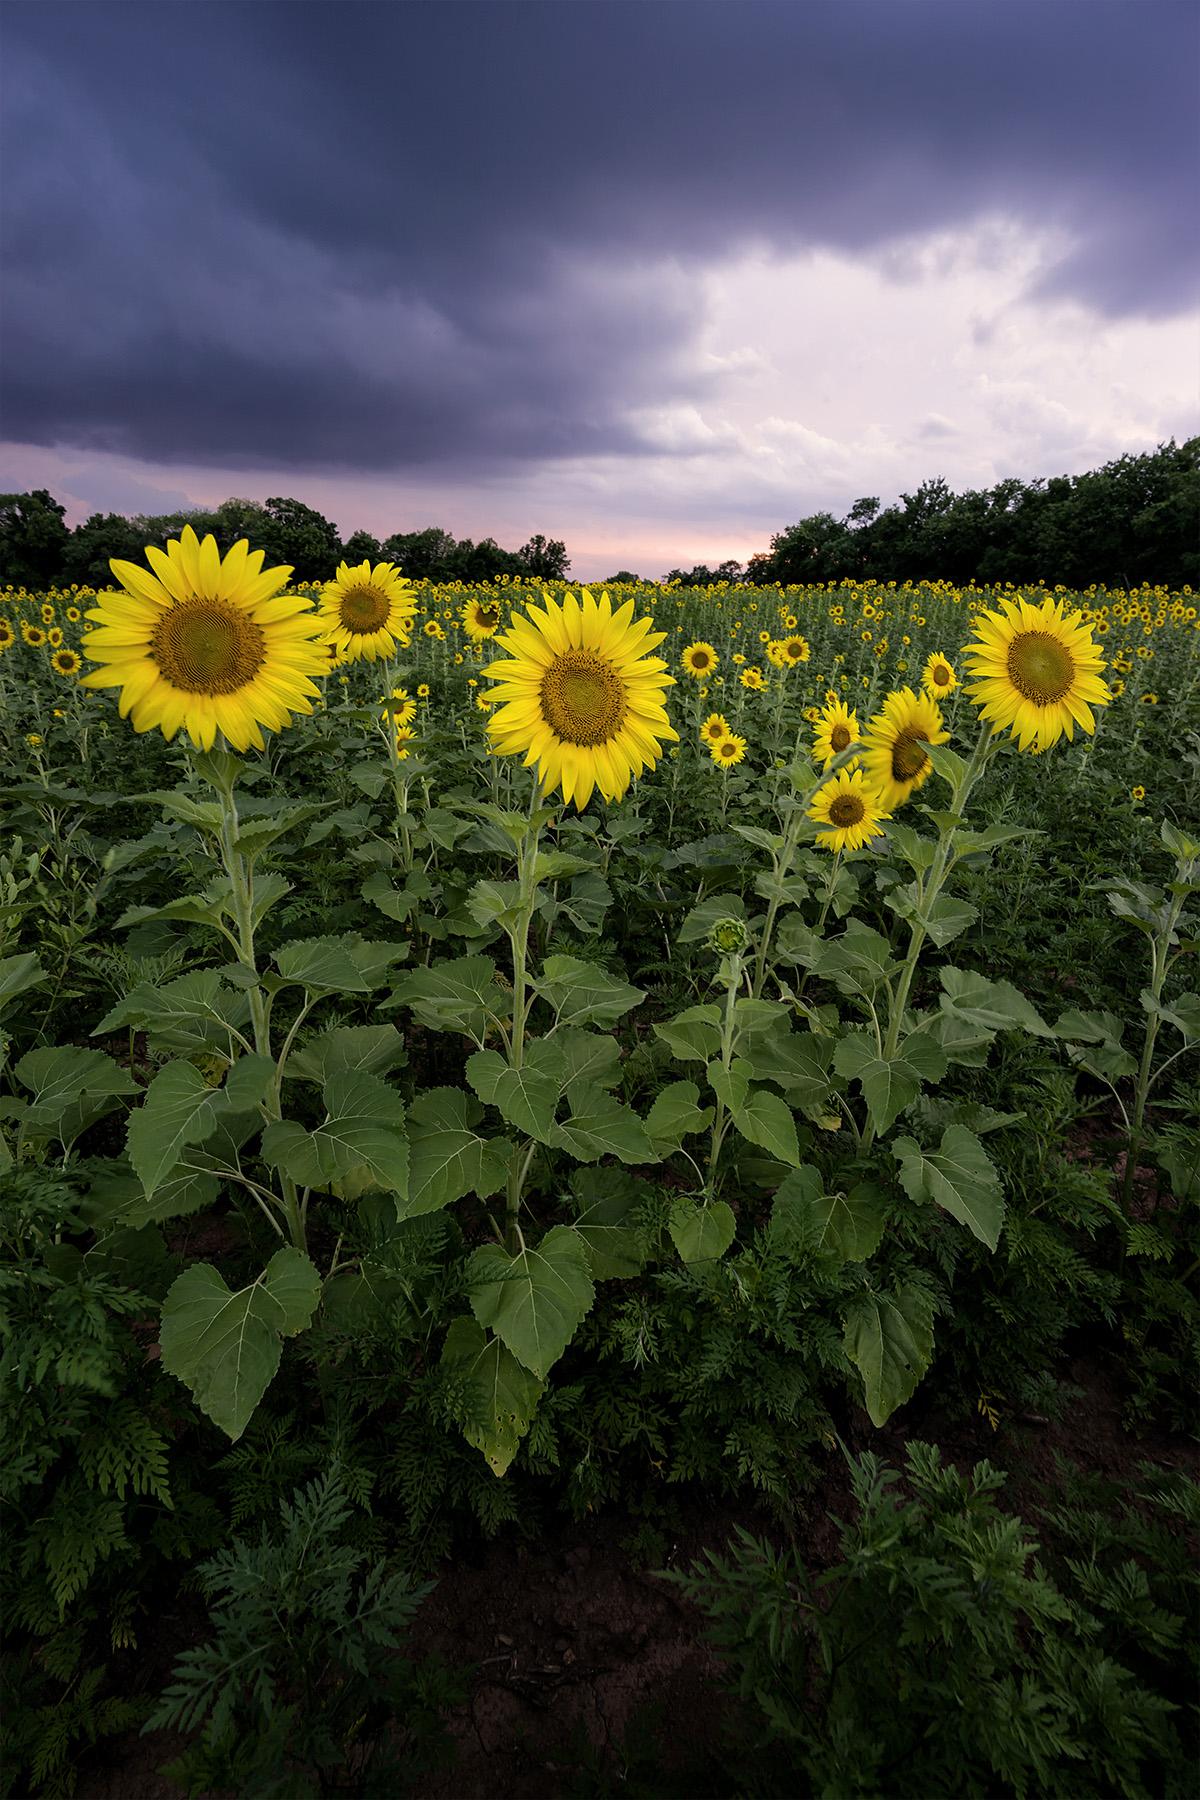 sunflower, sunflower fields, sunflower seeds, maryland, ms, mckee beshers, yellow, sunset, poolesville, summer, clouds, storm